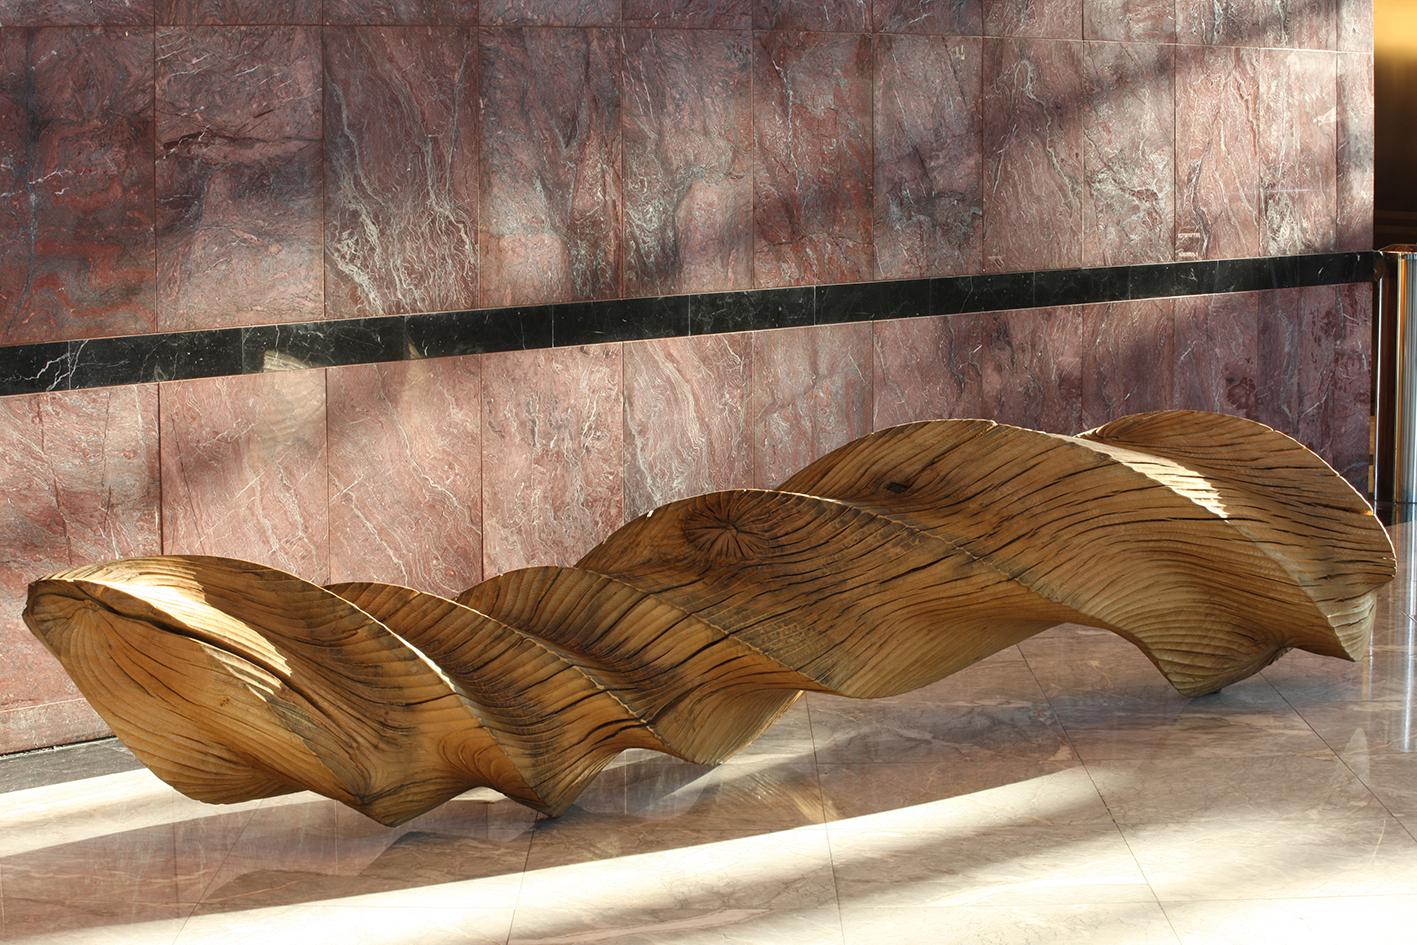 Twisting,   The Ripple Effect (2008) .1 Canada Square, Canary Wharf, London.Photo: Heini Schneebeli